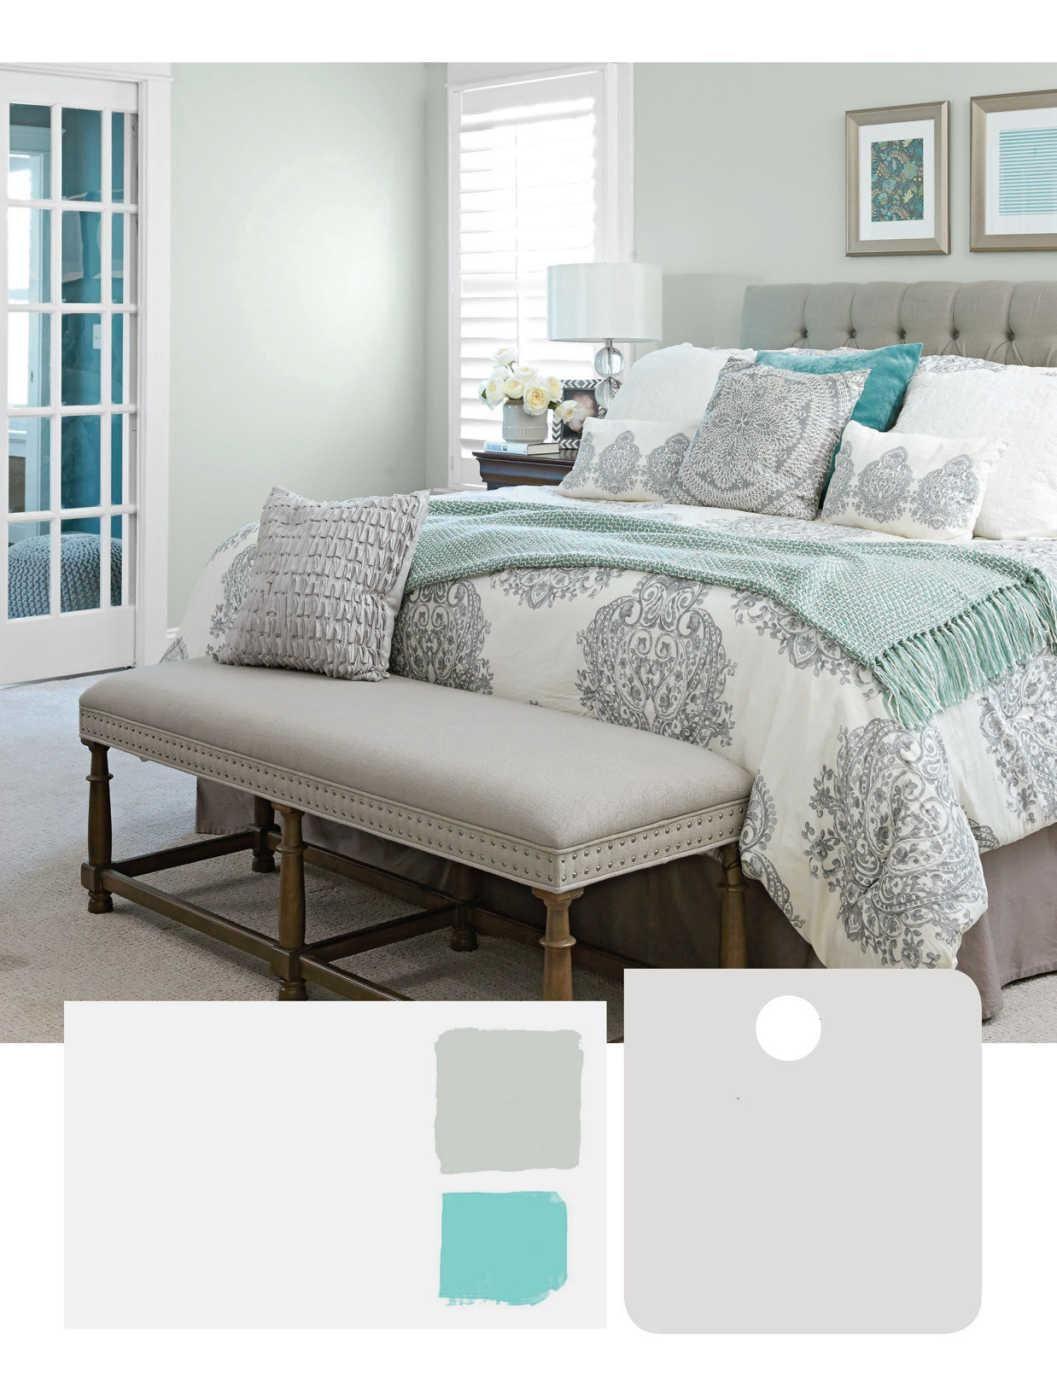 Pin By Mallory Jarrold On Bedroom Ideas Master Bedrooms Decor